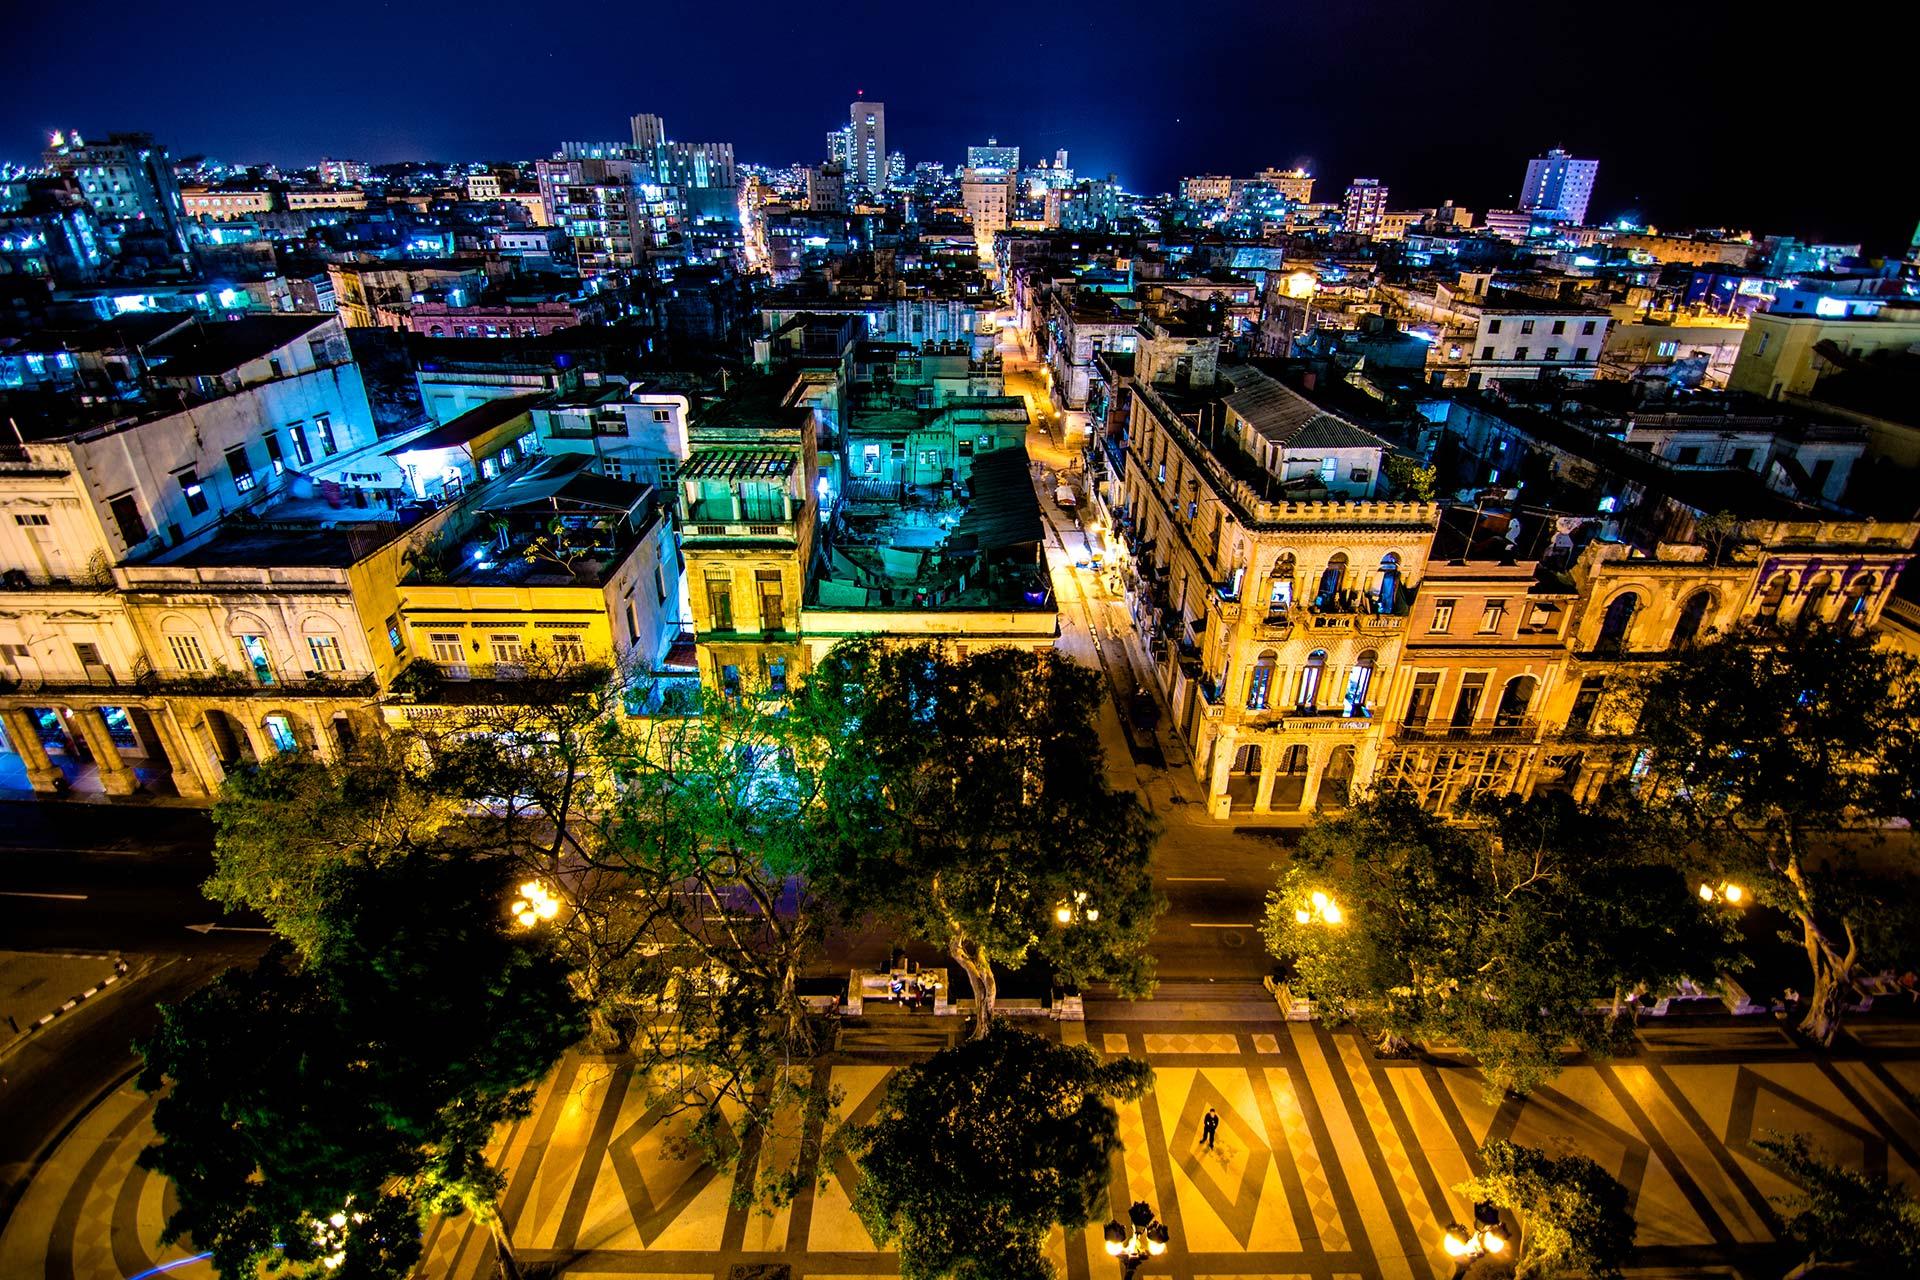 Nachtfotografie -Paseo del Prado, Havanna, Kuba